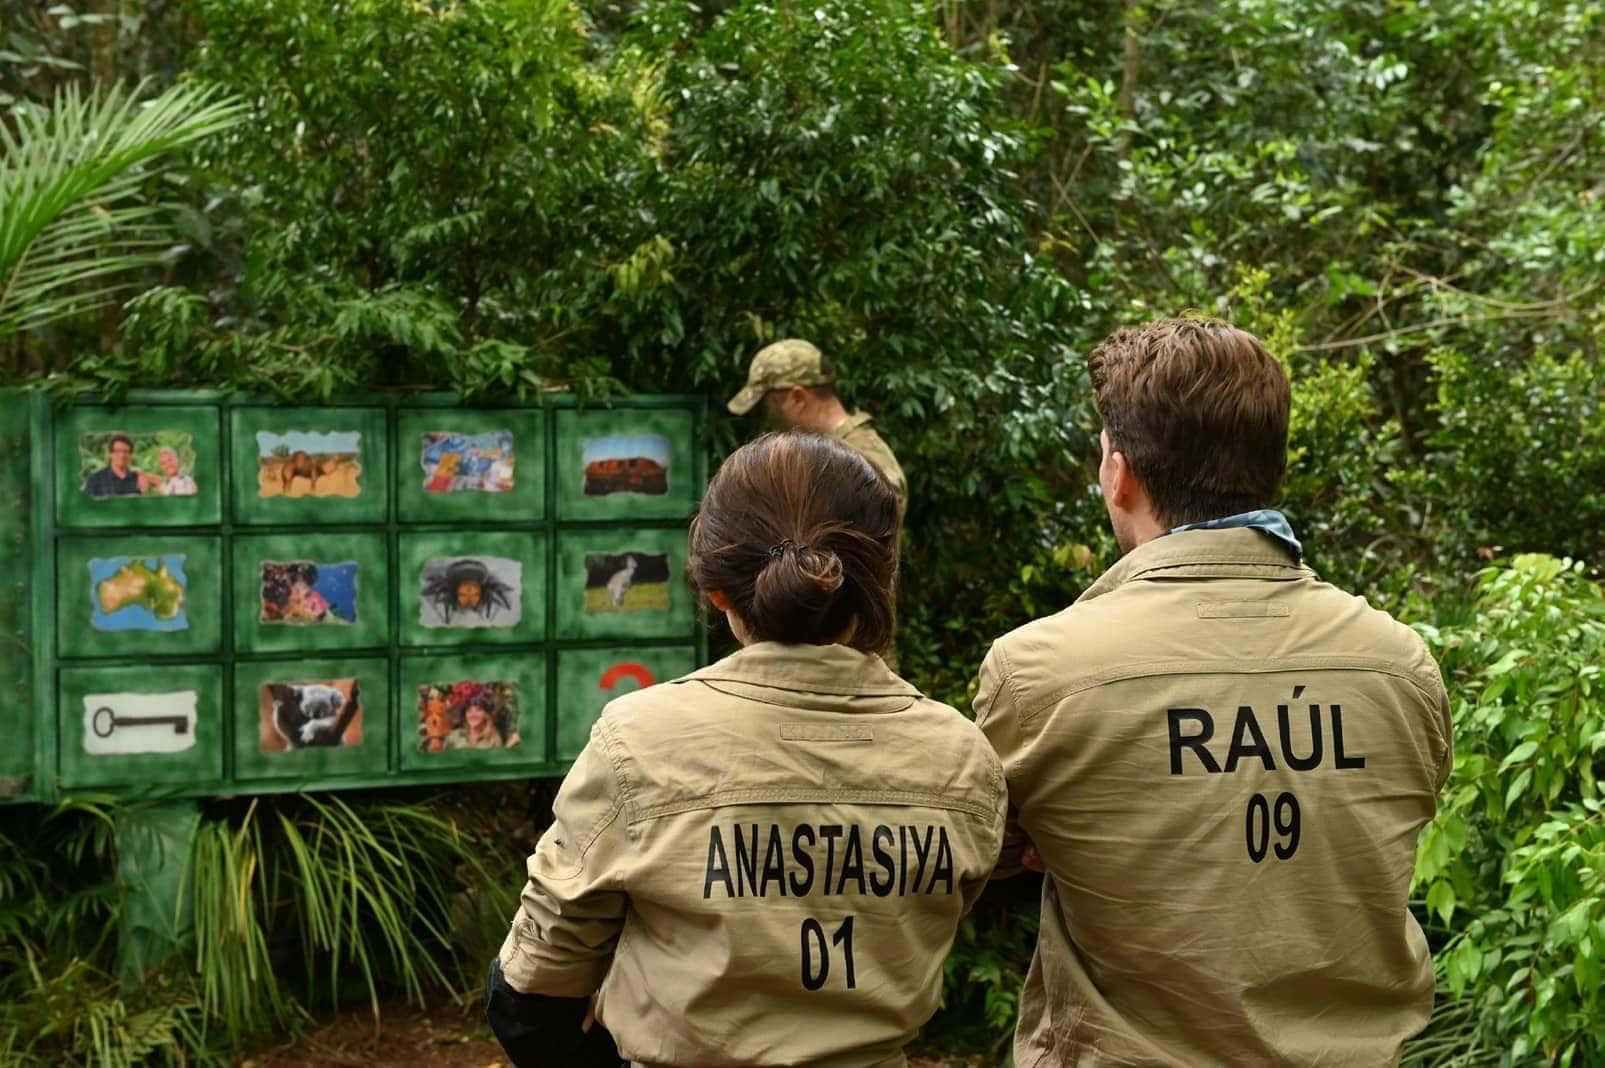 Dschungelcamp 2020 tag 5 Anastasiya Avilova Raul Richter